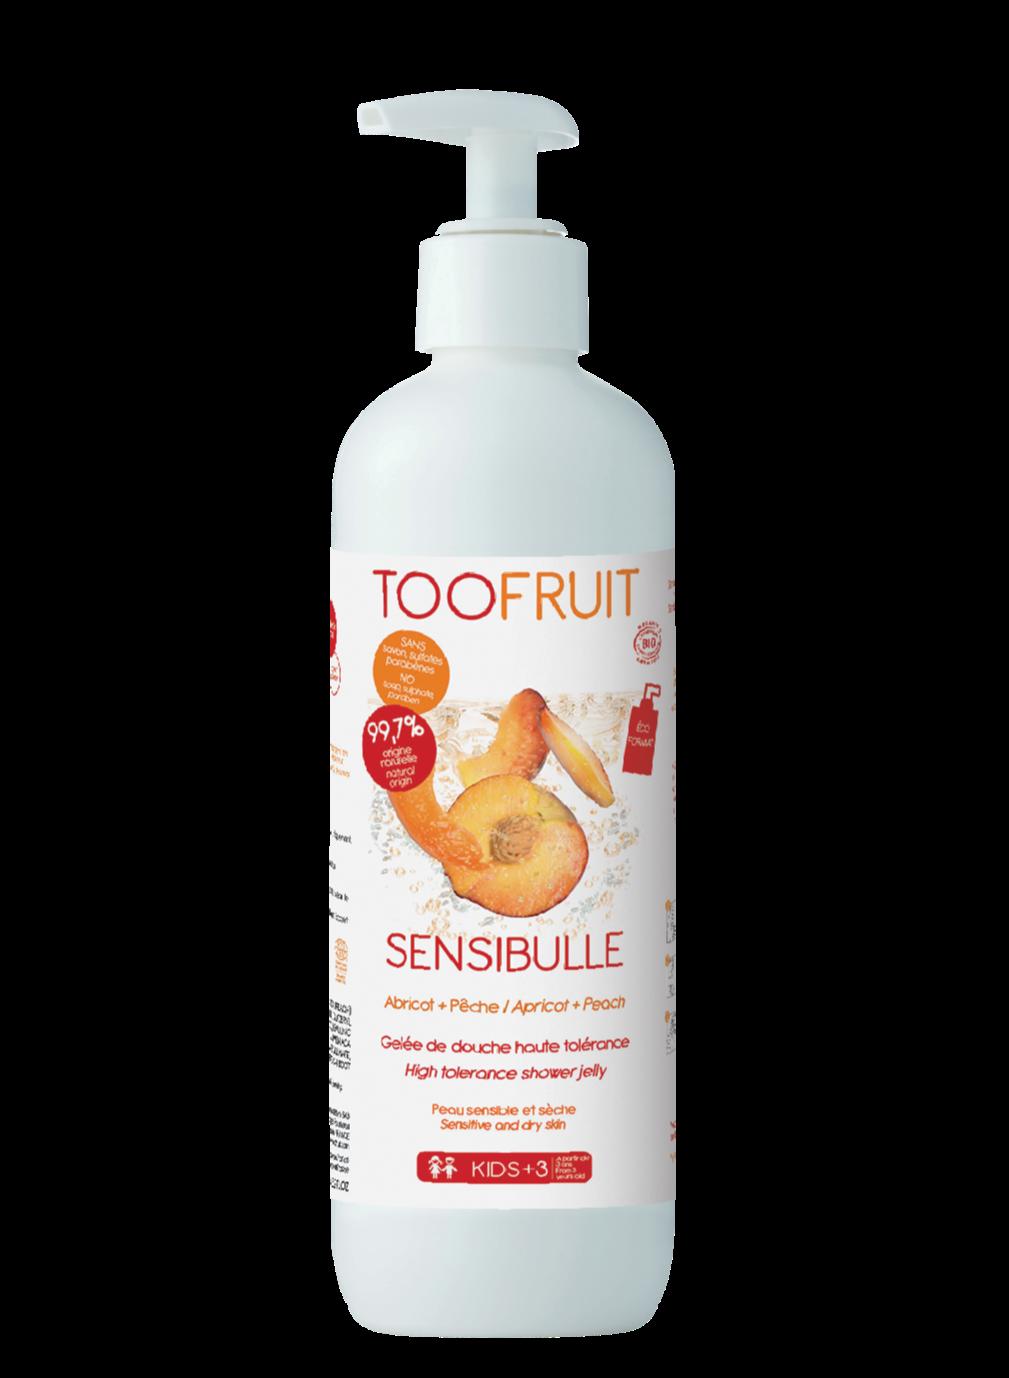 SENSIBULLE-gel-douche-abricot-peche-400ml